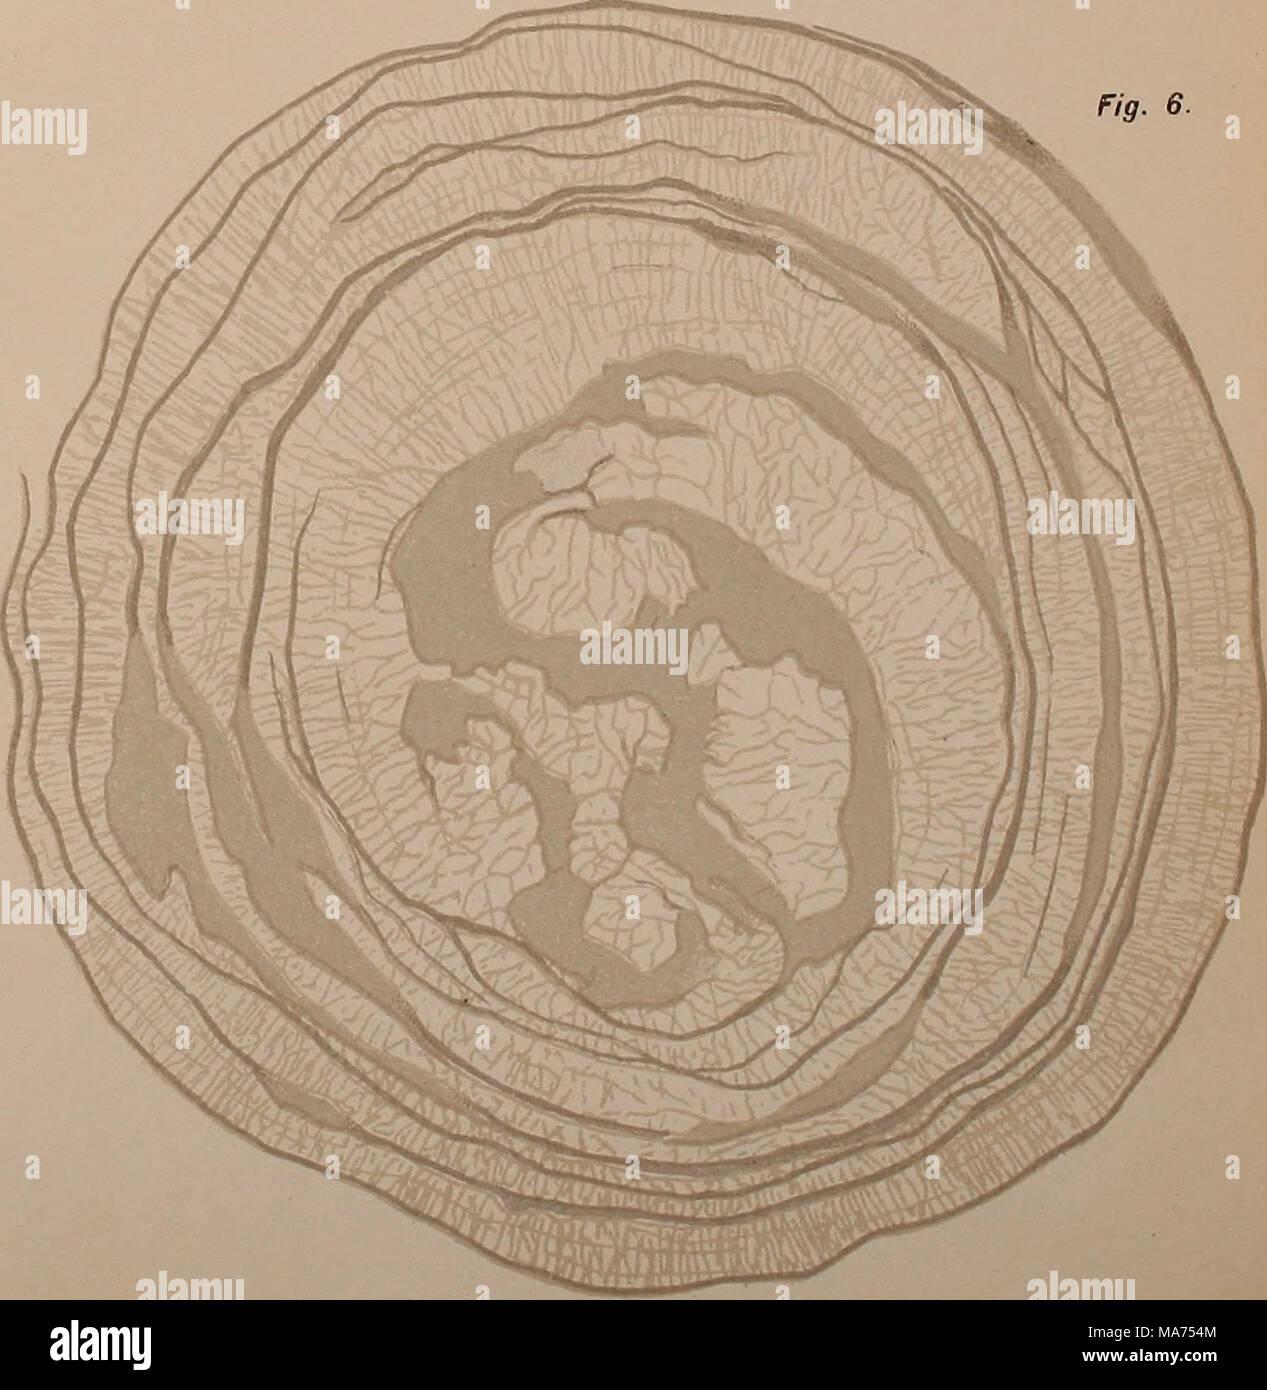 . Eerste ontwikkelingsstadiÃ«n van Megalobatrachus maximus Schlegel . fi^- I, III, V, VI Mej. J.Mételeekamp, del., fig- II en IV L. Â¥â de Bus3ï. del LHh. .1. H. 1»; Br; - Stock Image